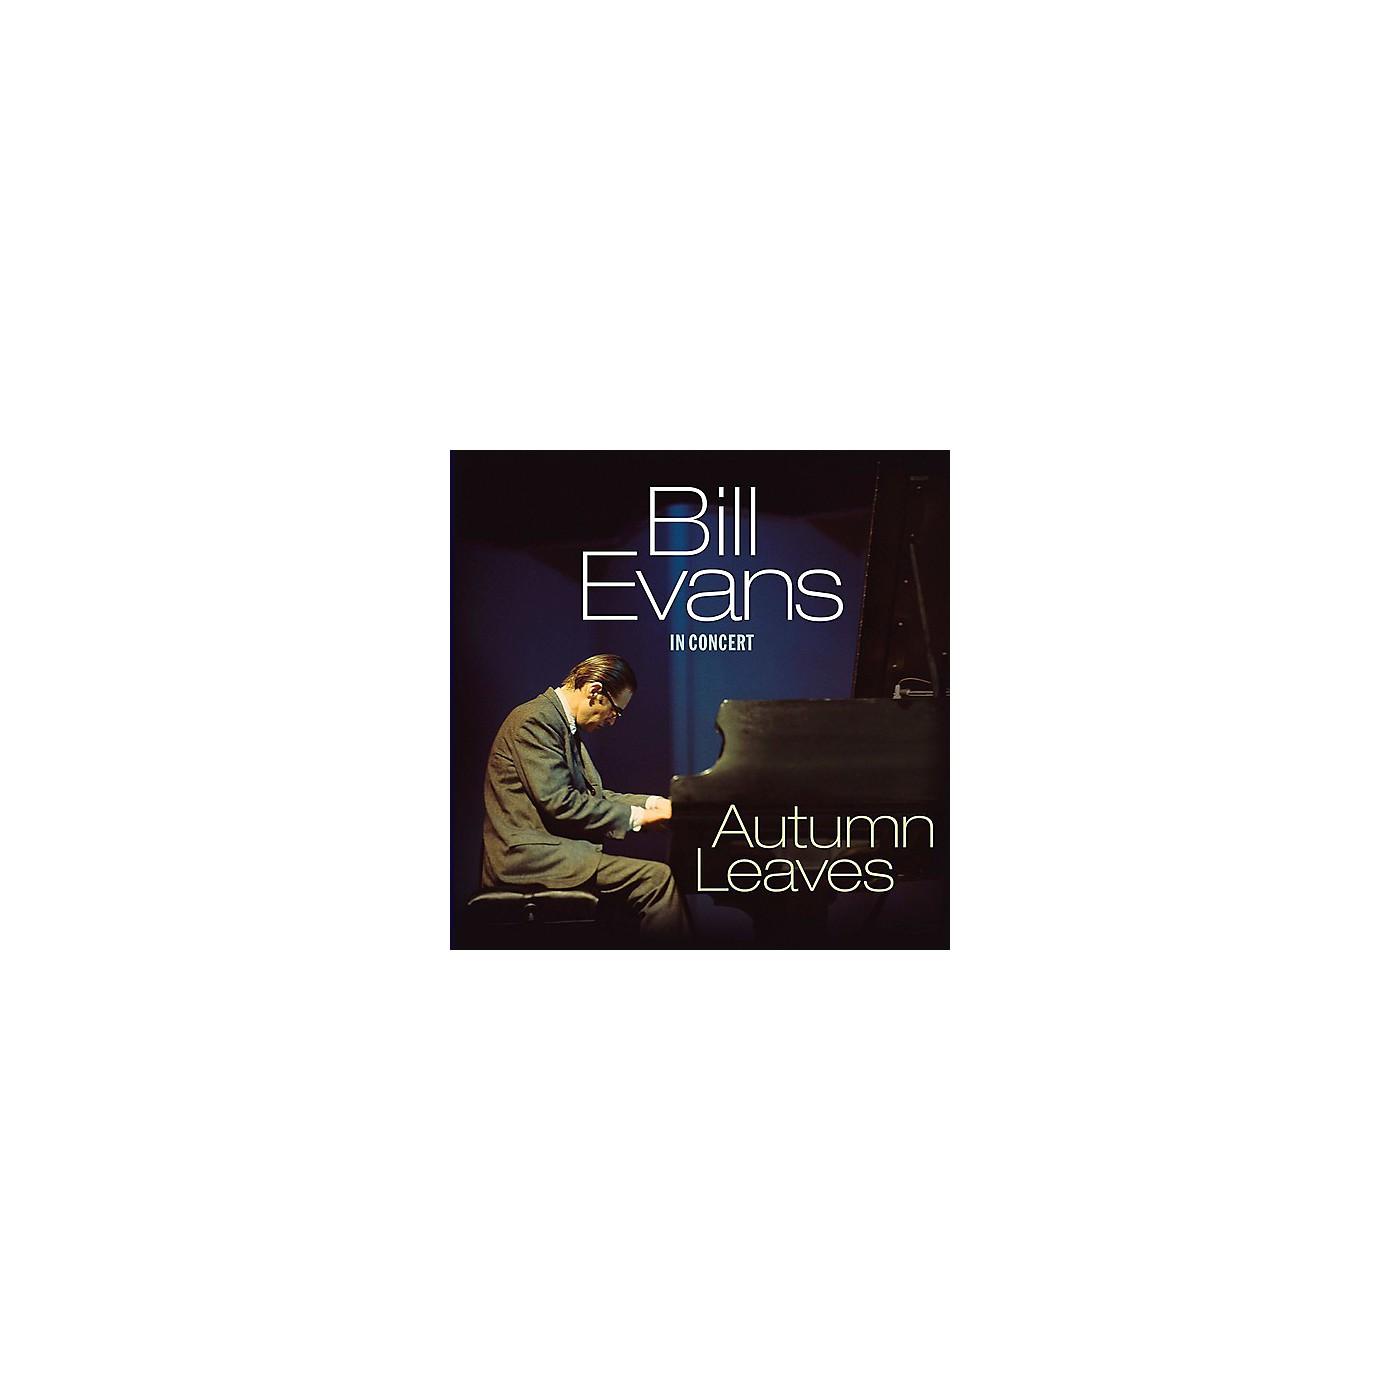 Alliance Bill Evans - Autumn Leaves: In Concert thumbnail